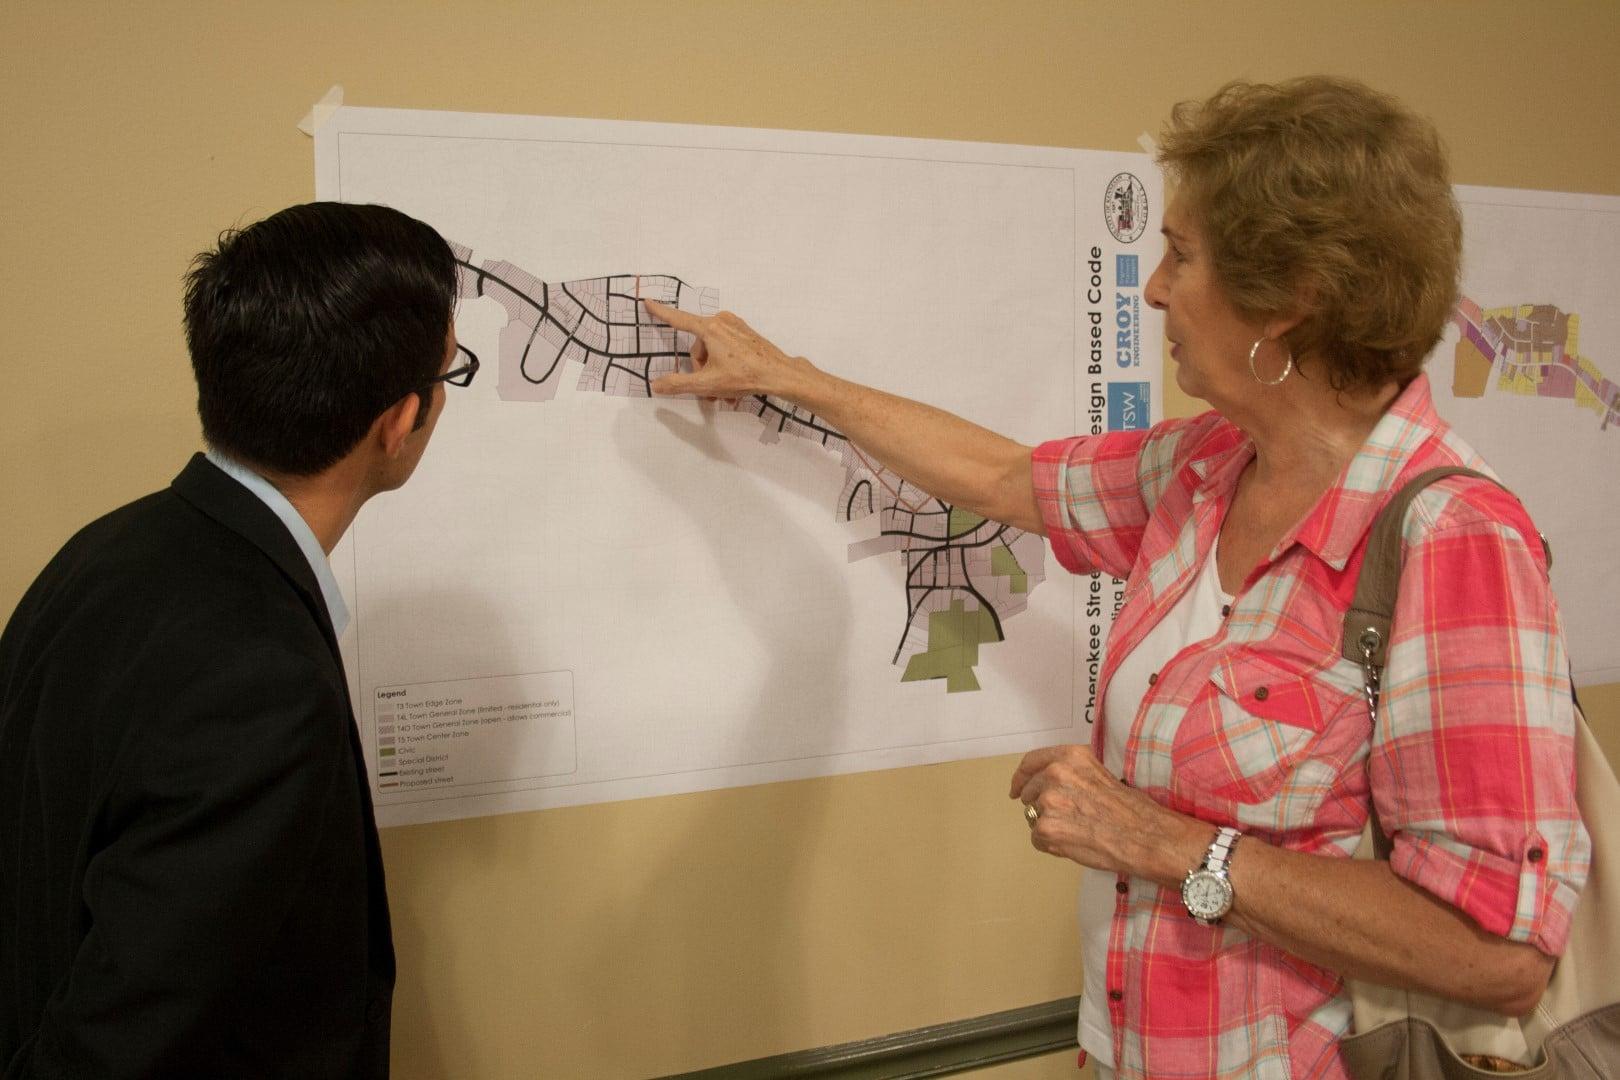 Cherokee Street Corridor Gateway Visioning Plan